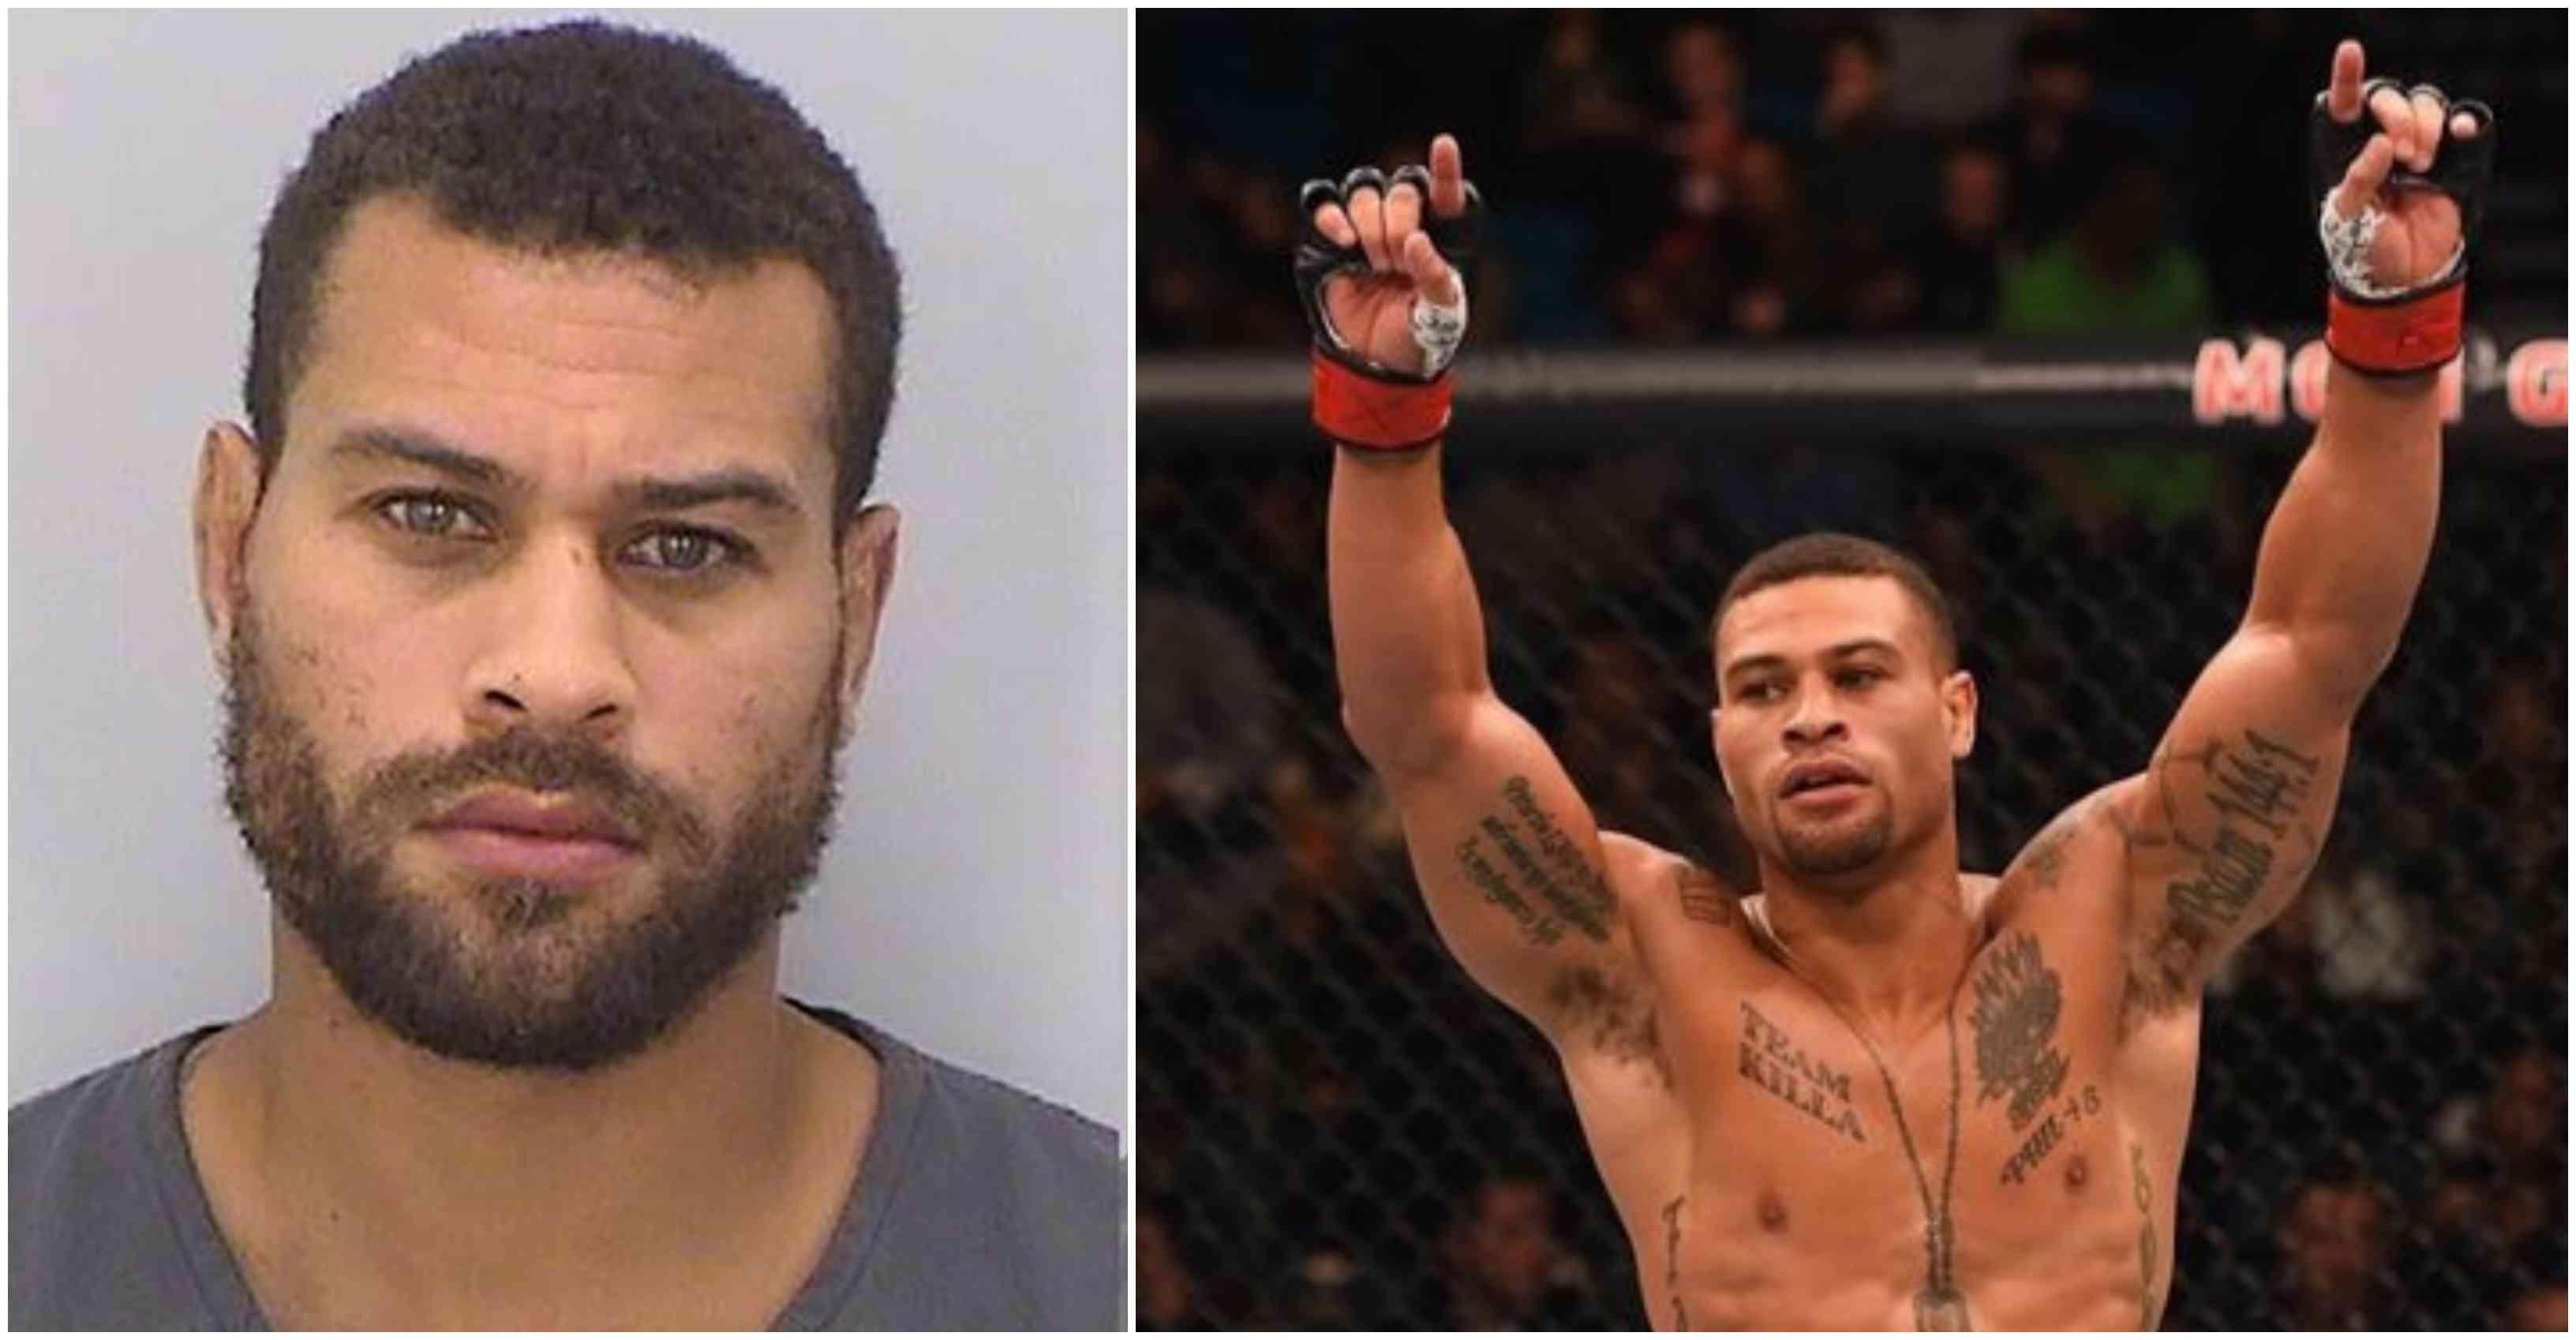 UFC vet Abel Trujillo arrested for child porn - Trujillo